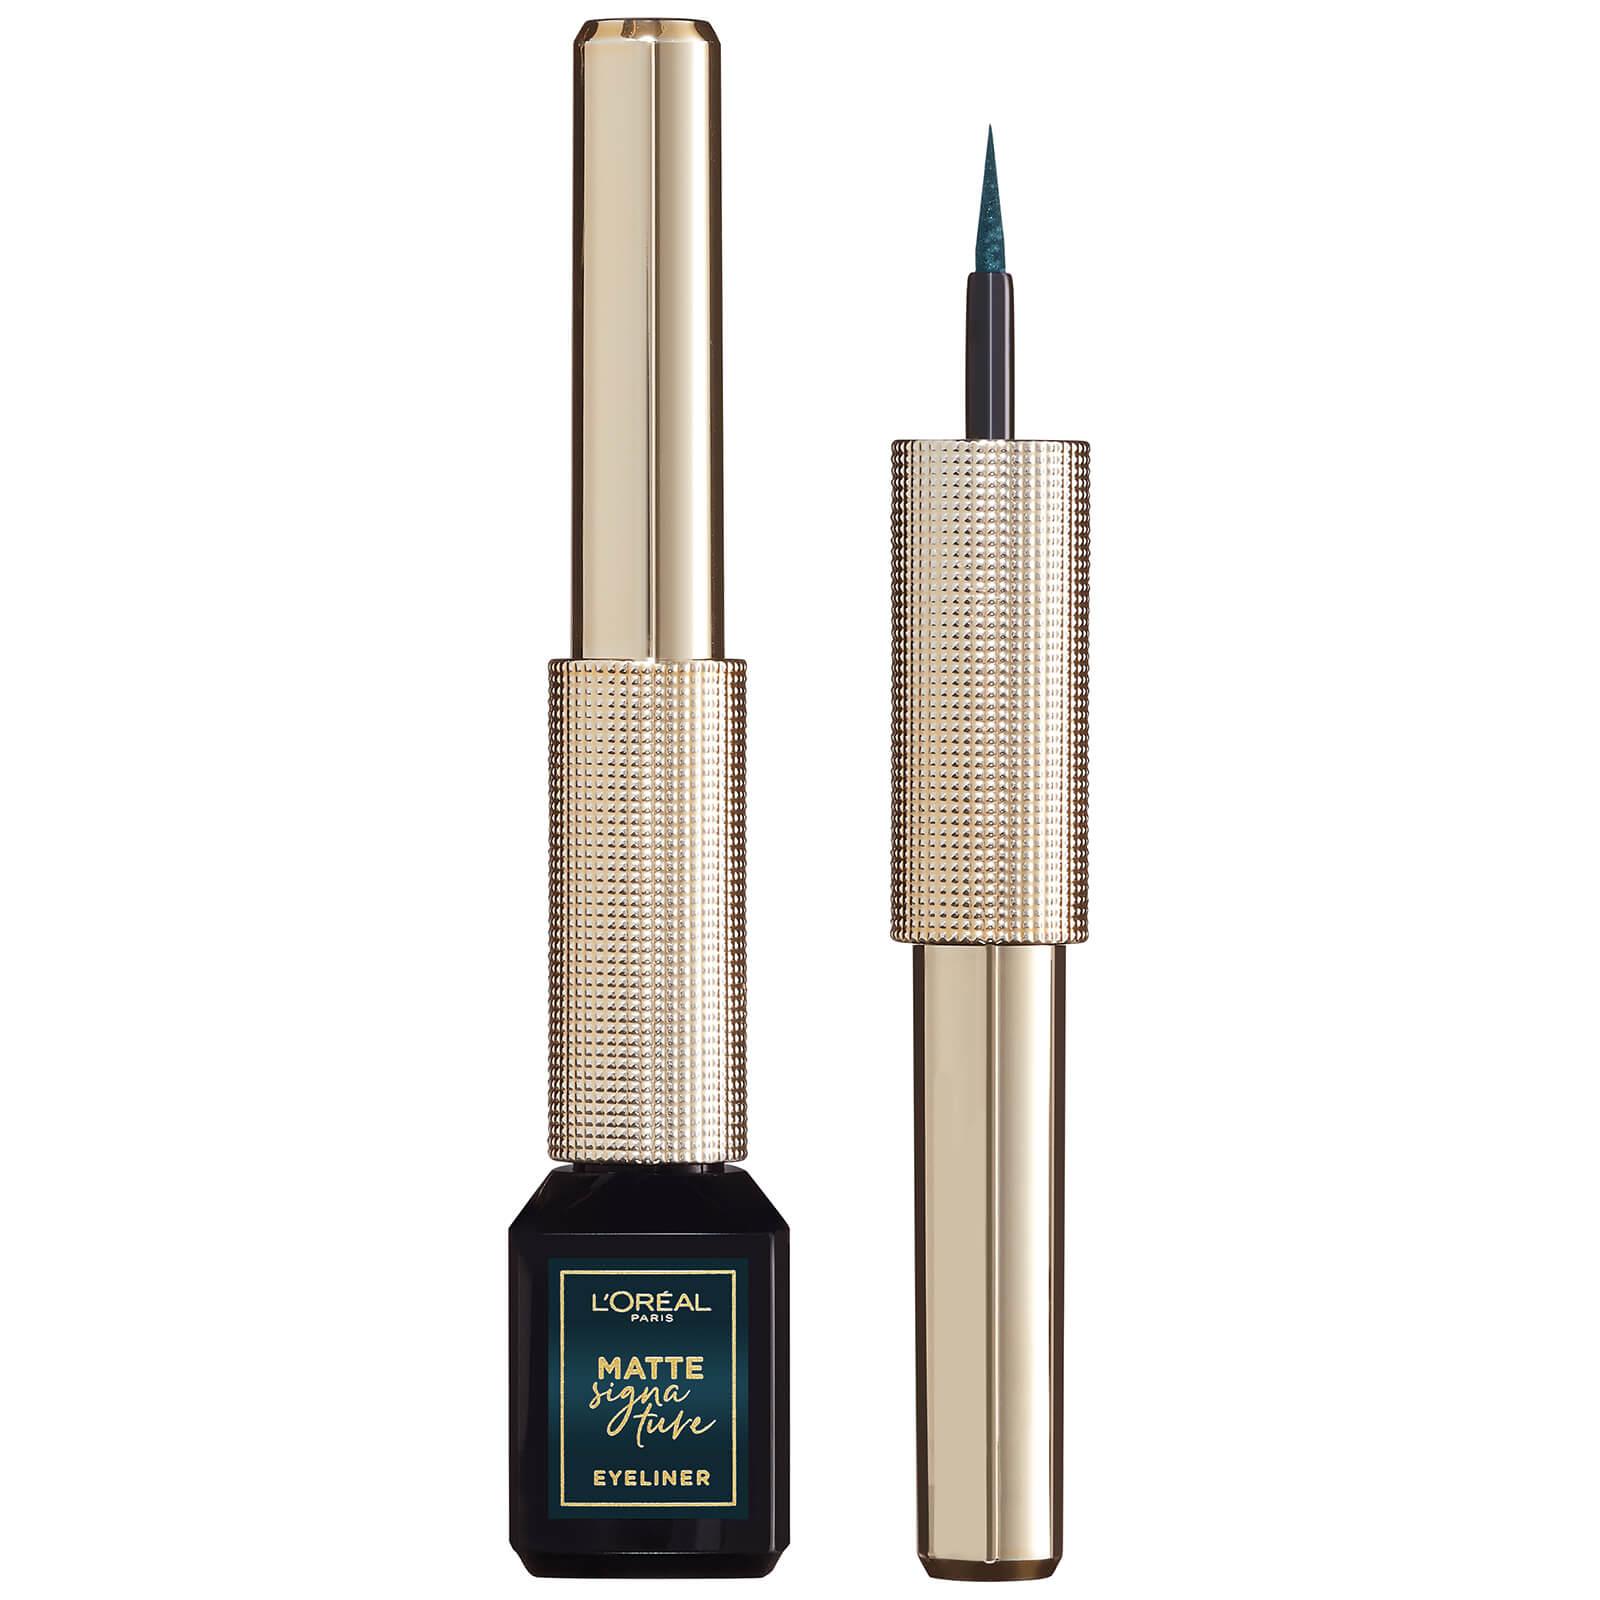 L'Oréal Paris Matte Signature Liquid Eyeliner 3ml (Various Shades) - 04 Green